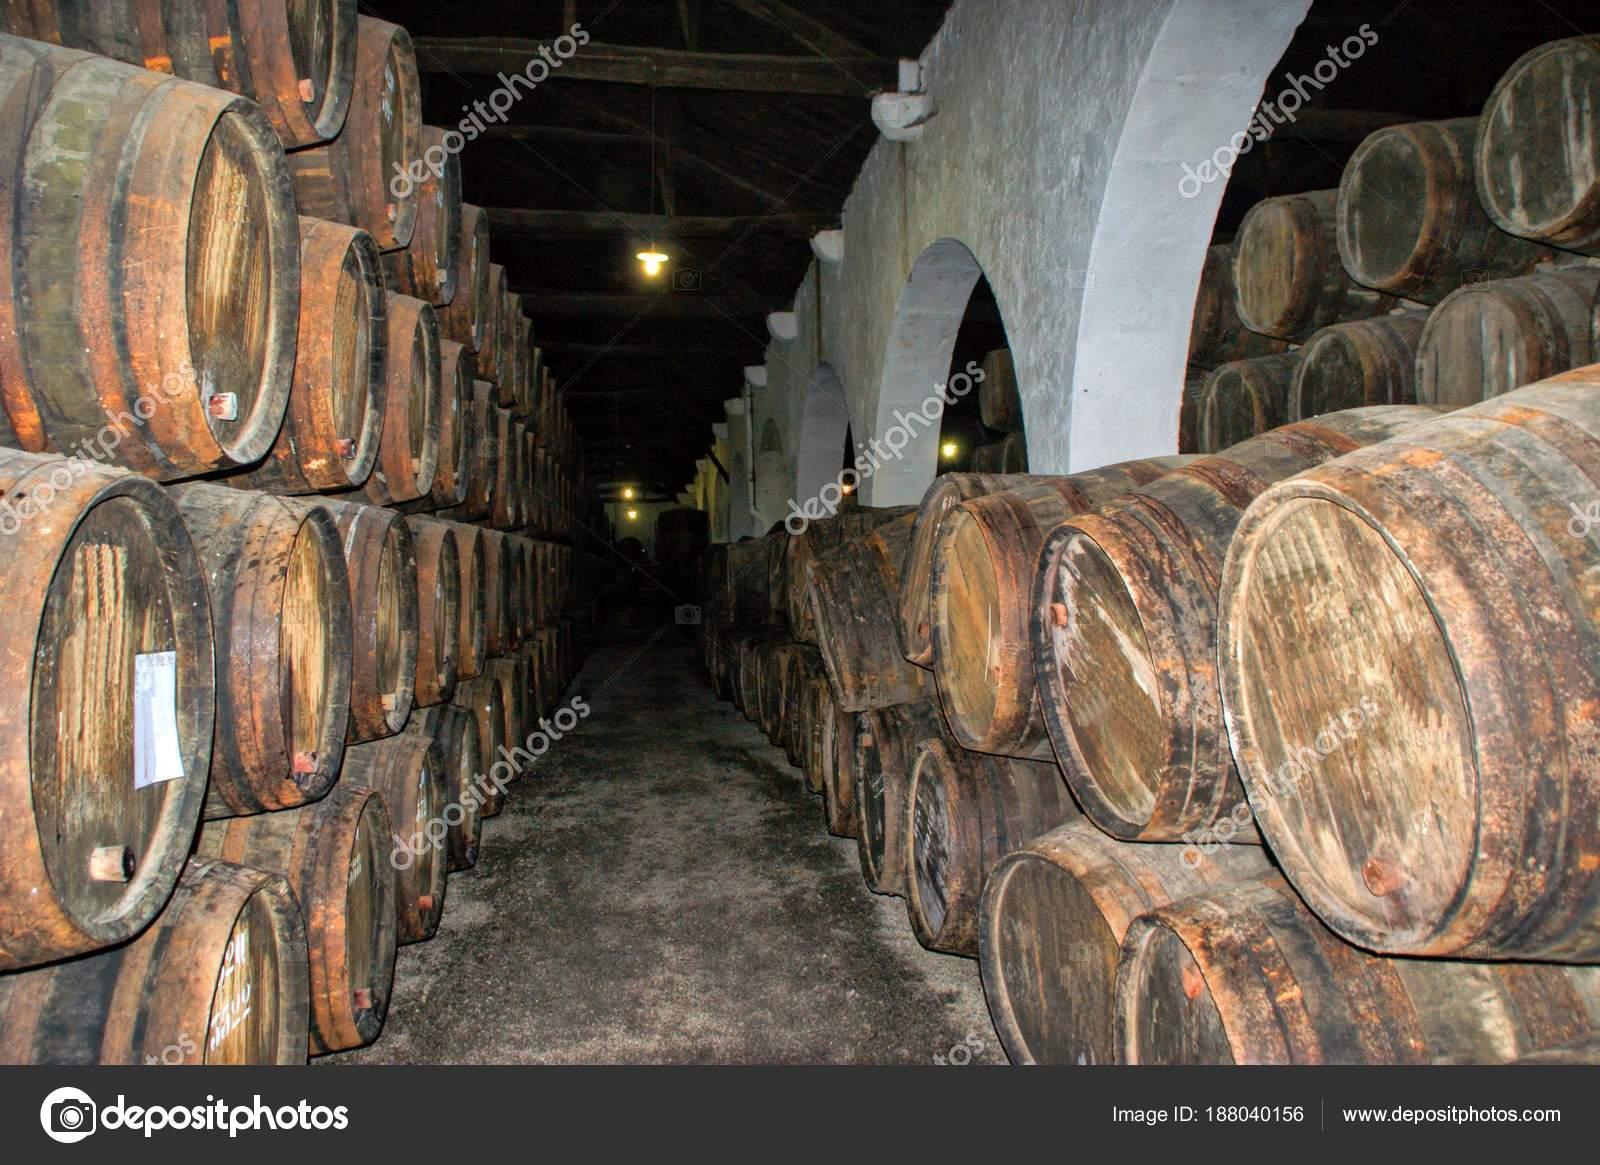 Port Wine Cellars in Vila Nova de Gaia, Portugal